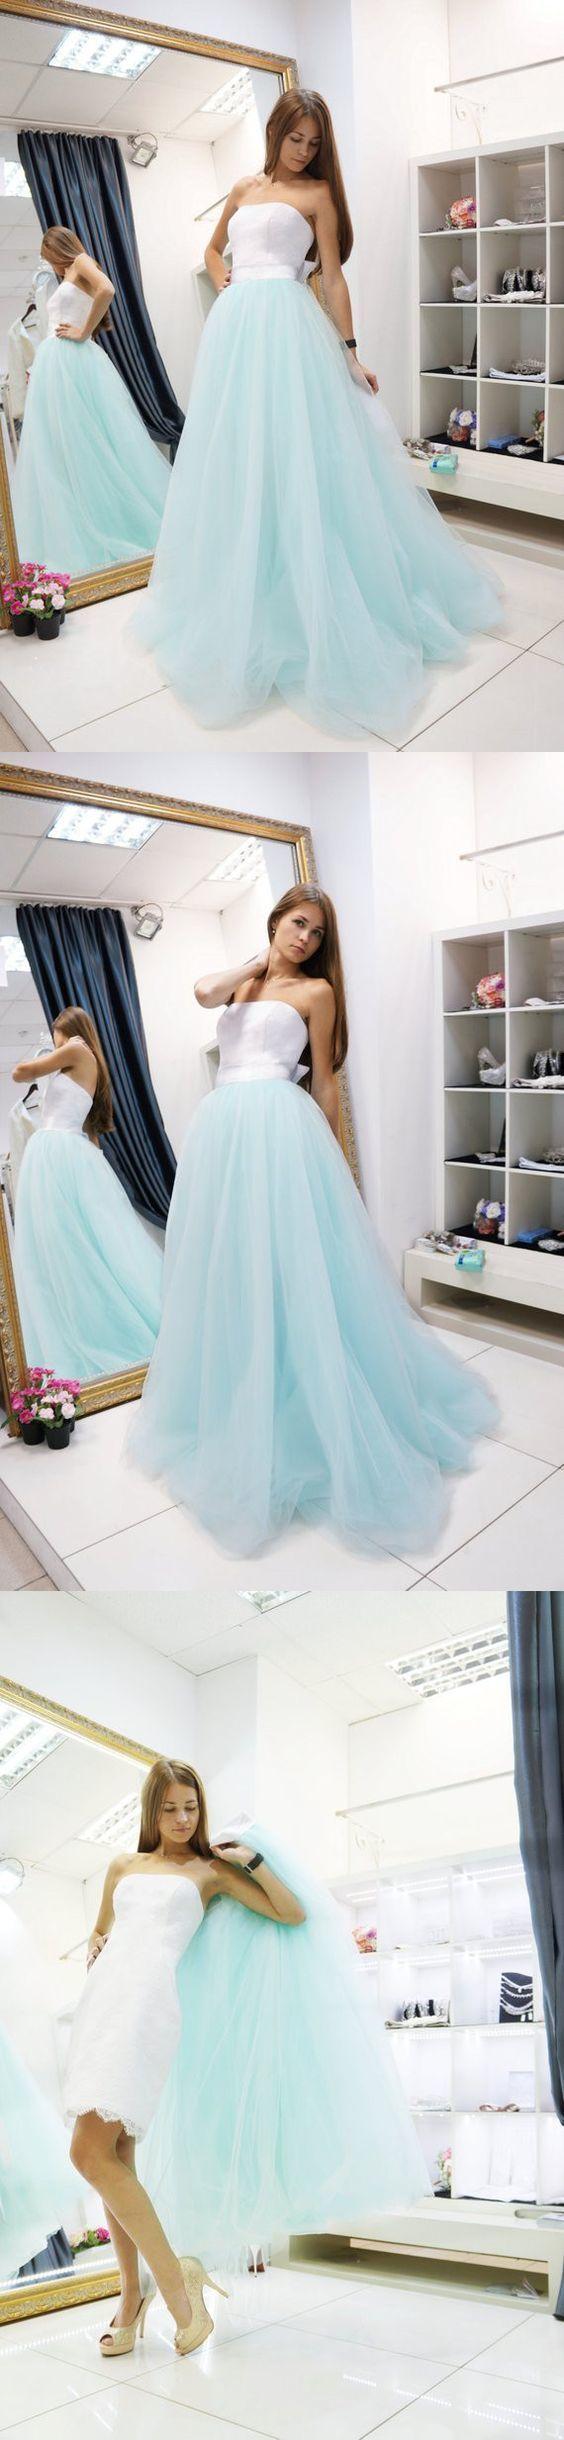 Strapless Cheap Prom Dresses Lace Long Prom Dress Evening Dress BD2189